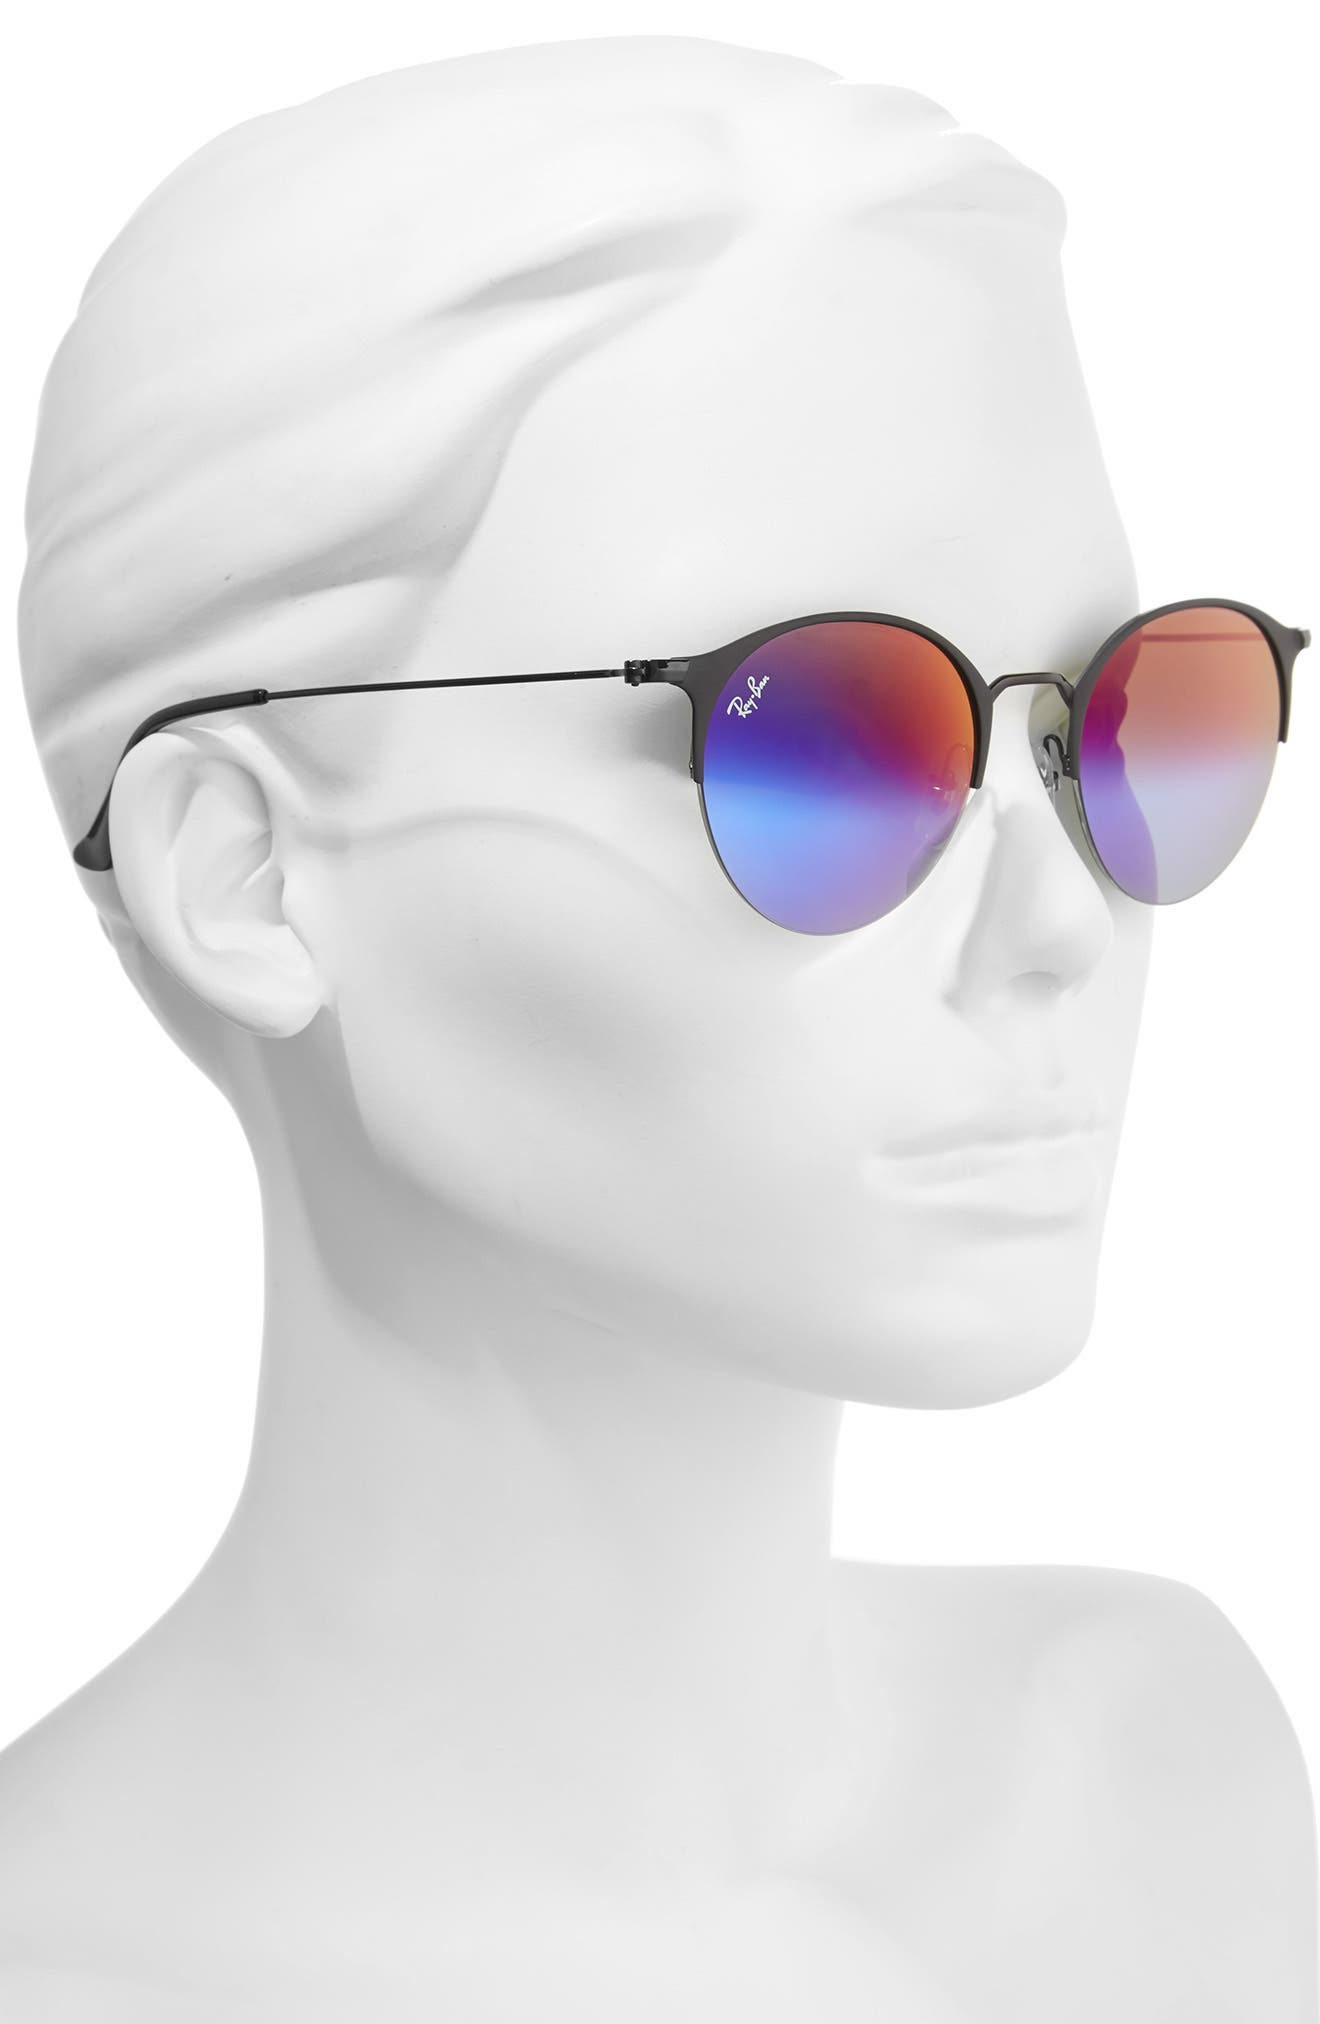 50mm Gradient Mirrored Sunglasses,                             Alternate thumbnail 2, color,                             001